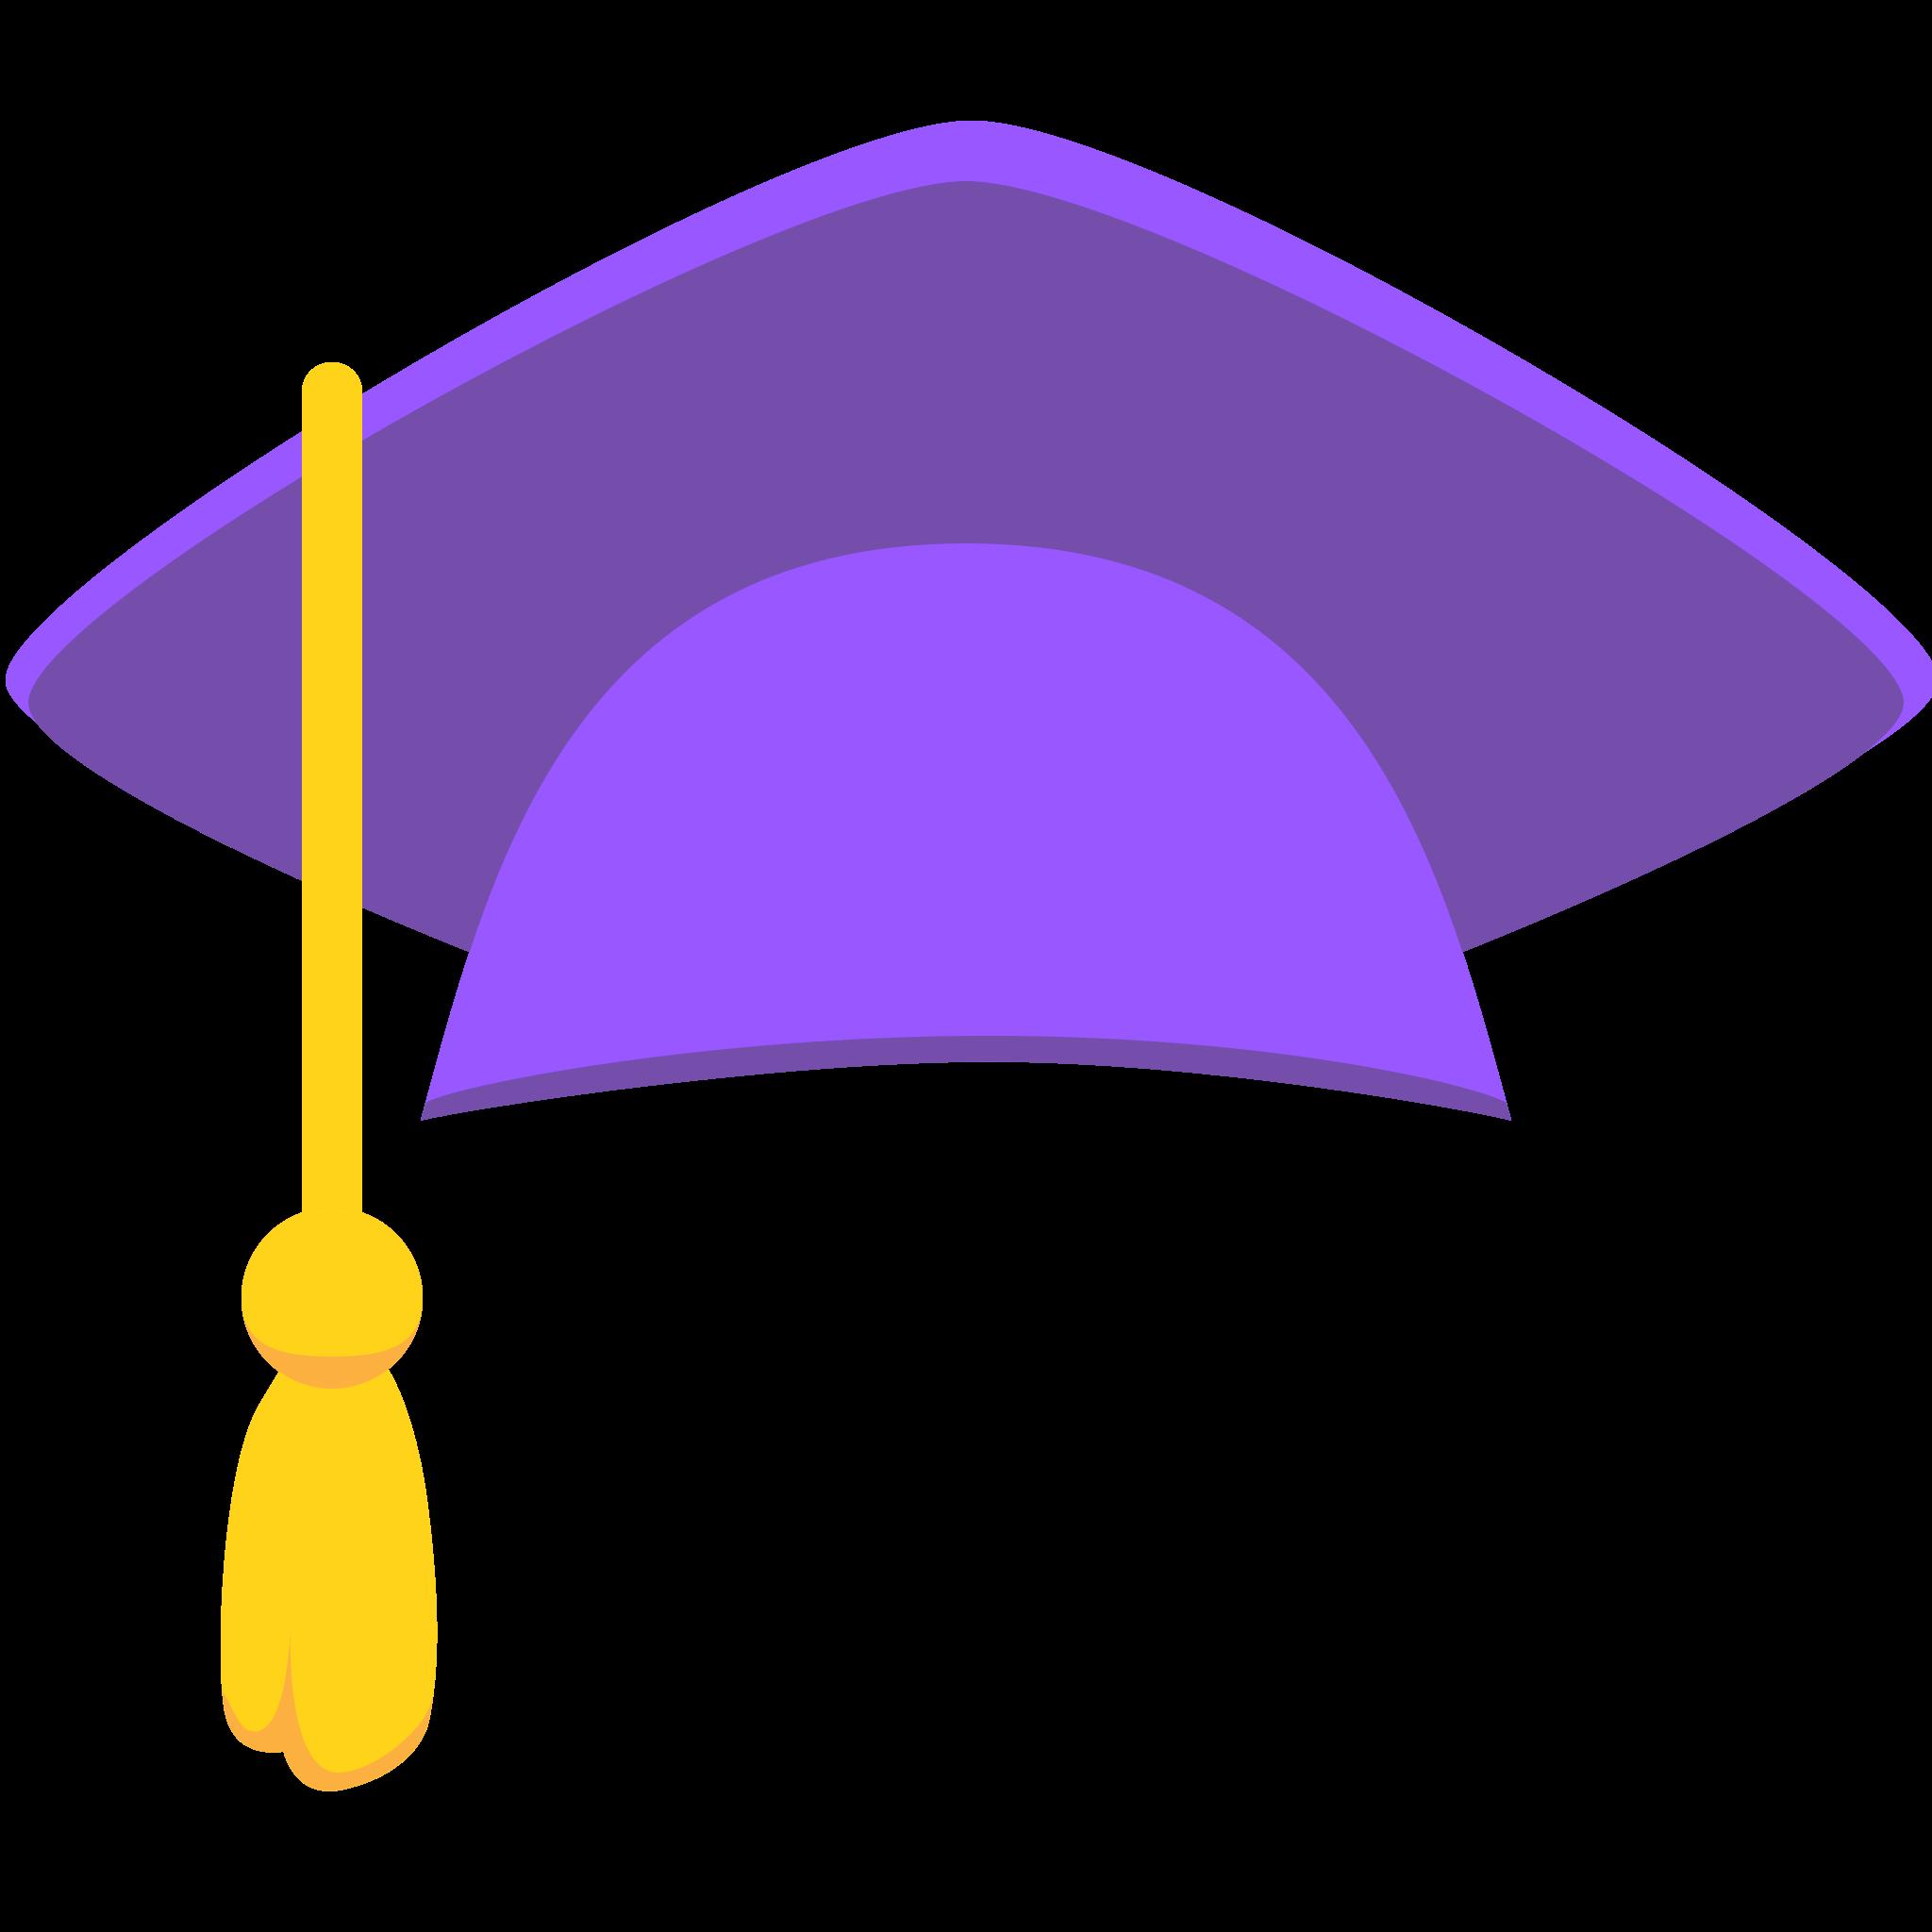 Graduation clipart sticker. Timeline hat